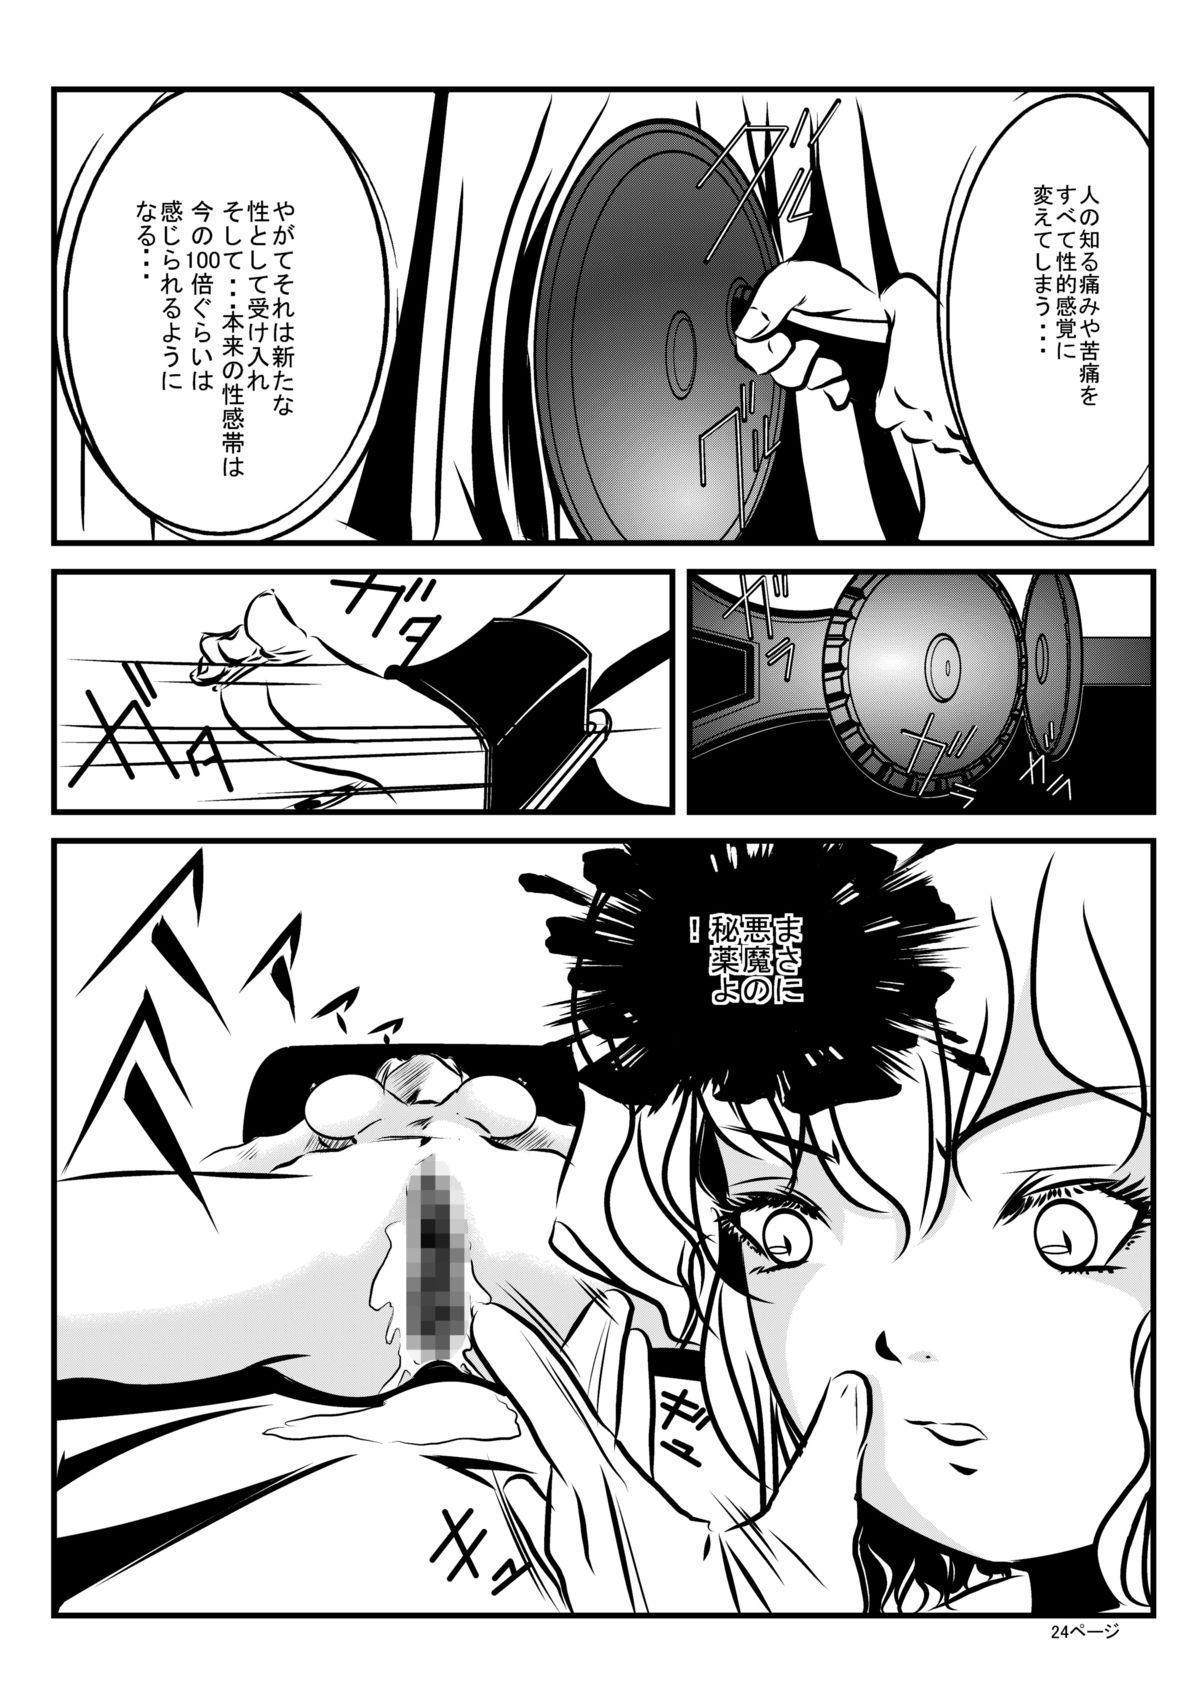 Loli Type no Jikkensitsu 22